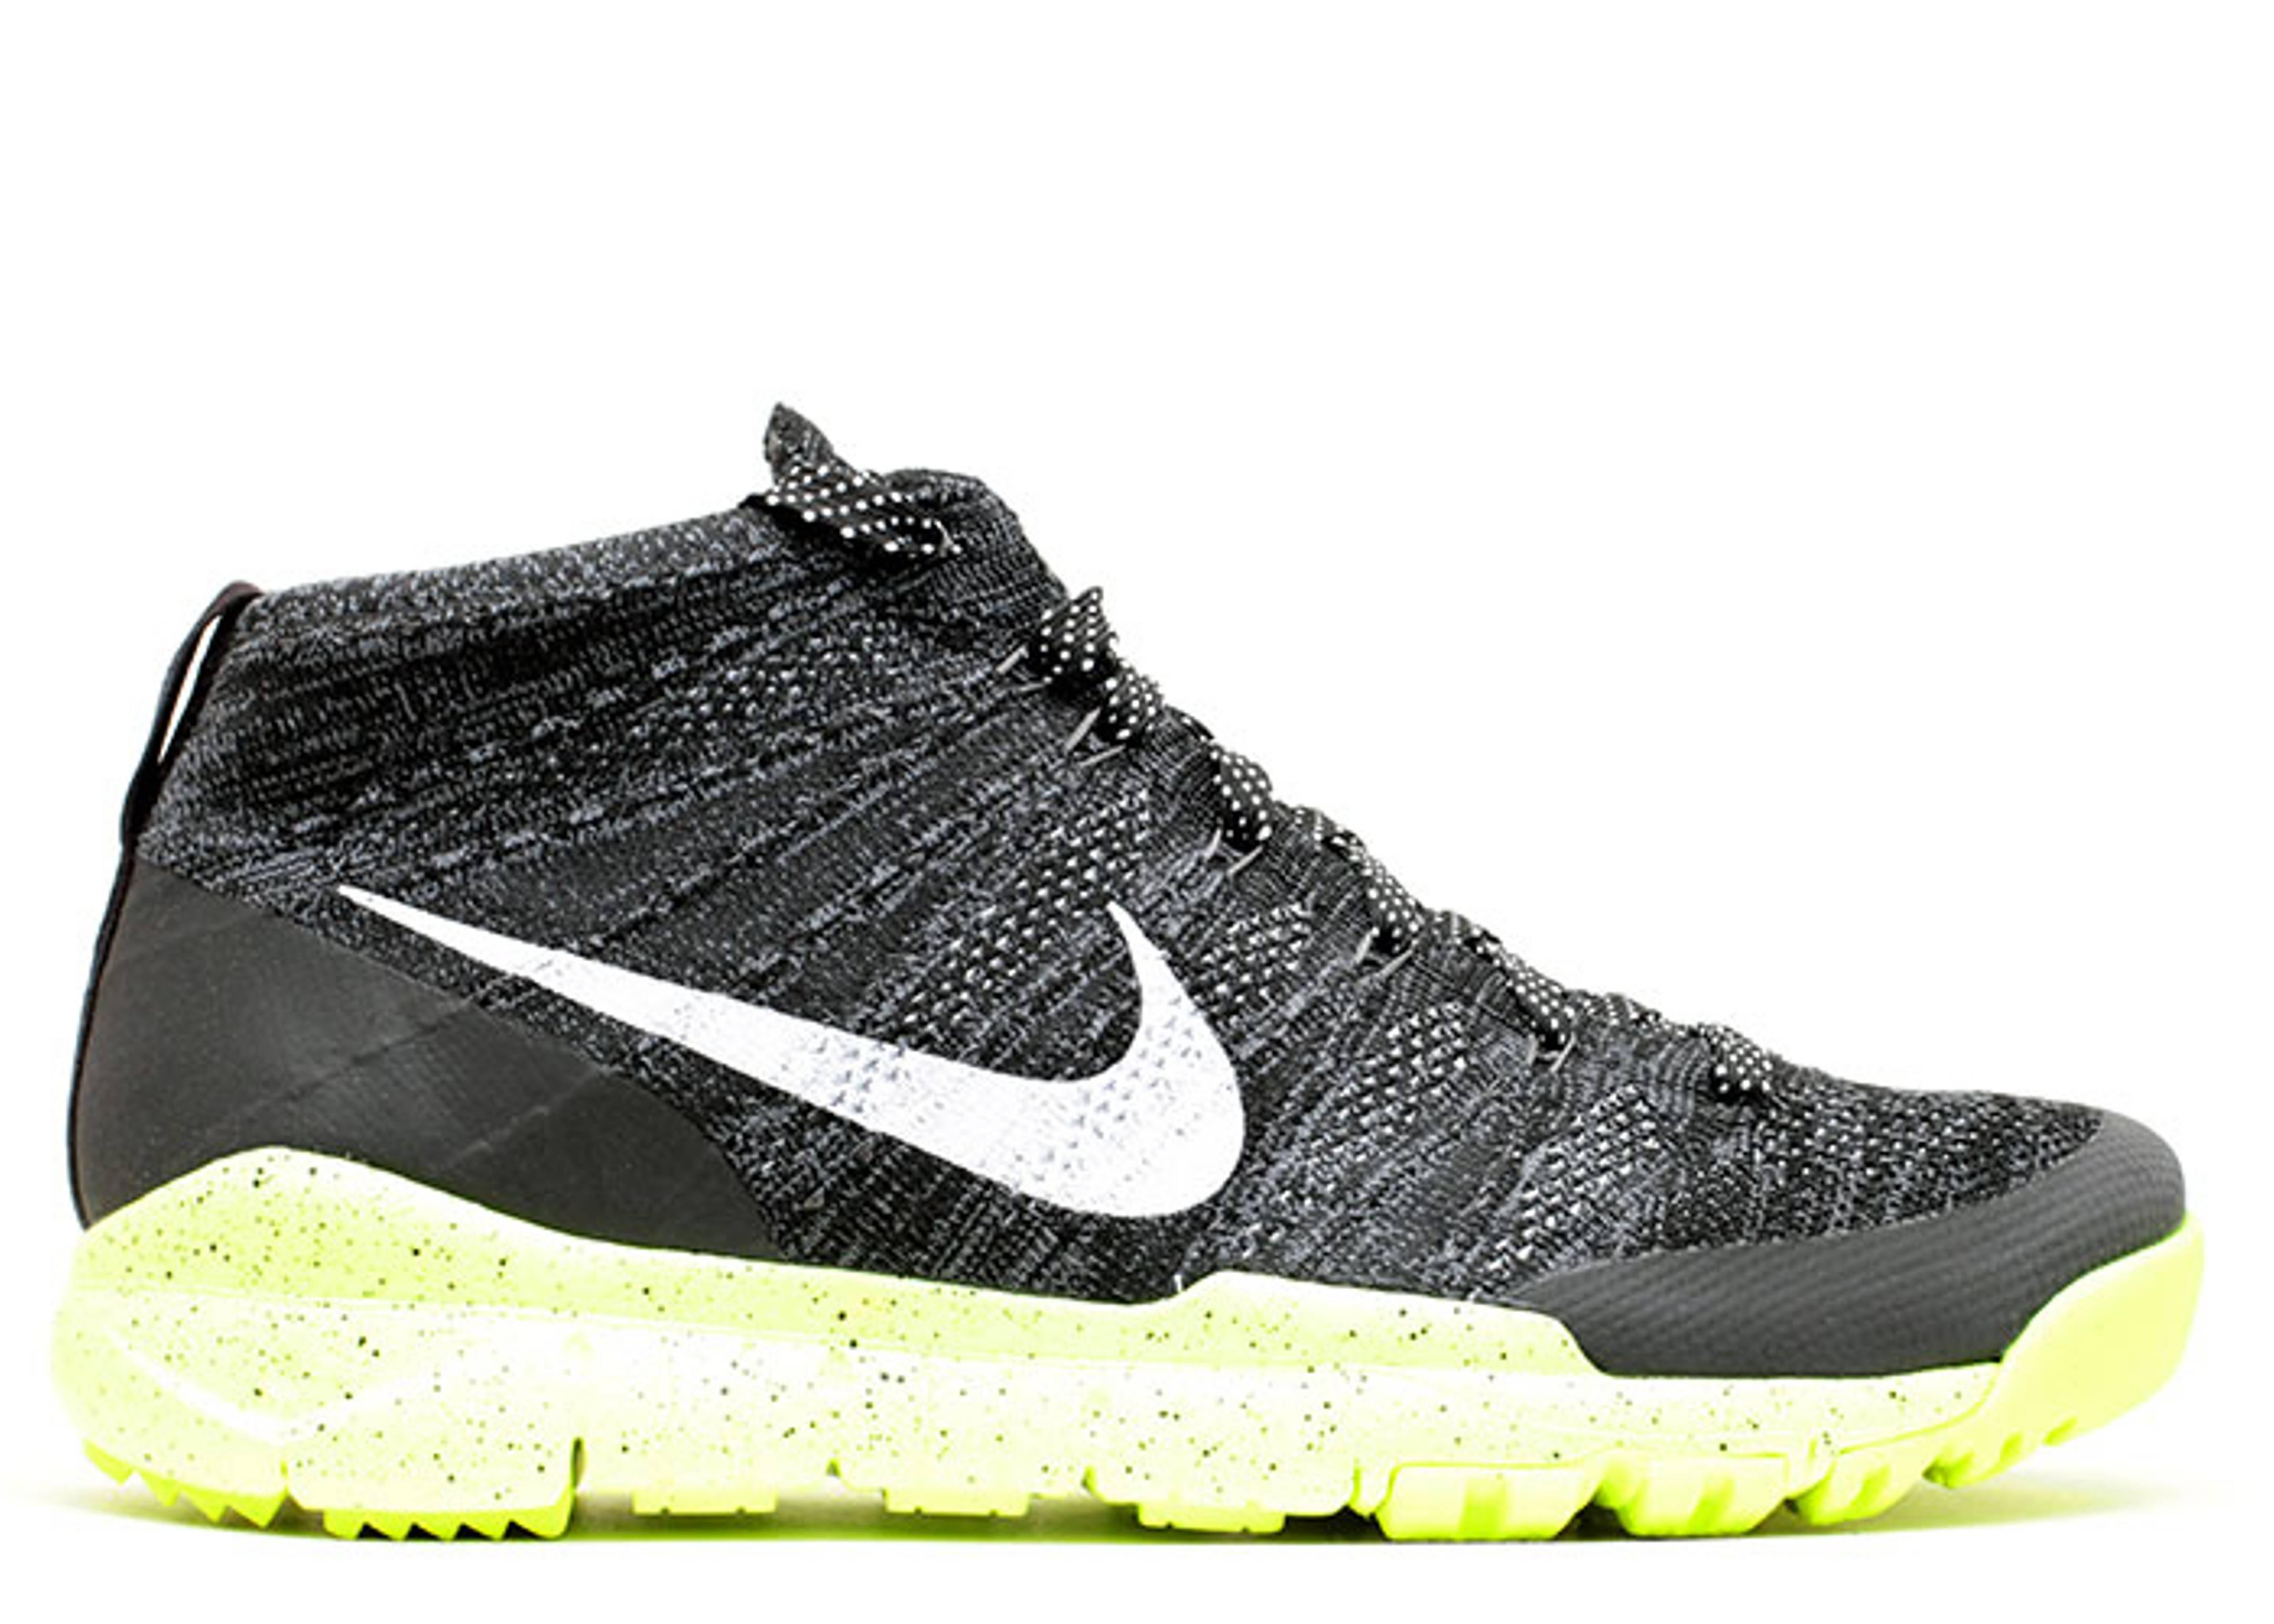 Nike Flyknit Chukka Black